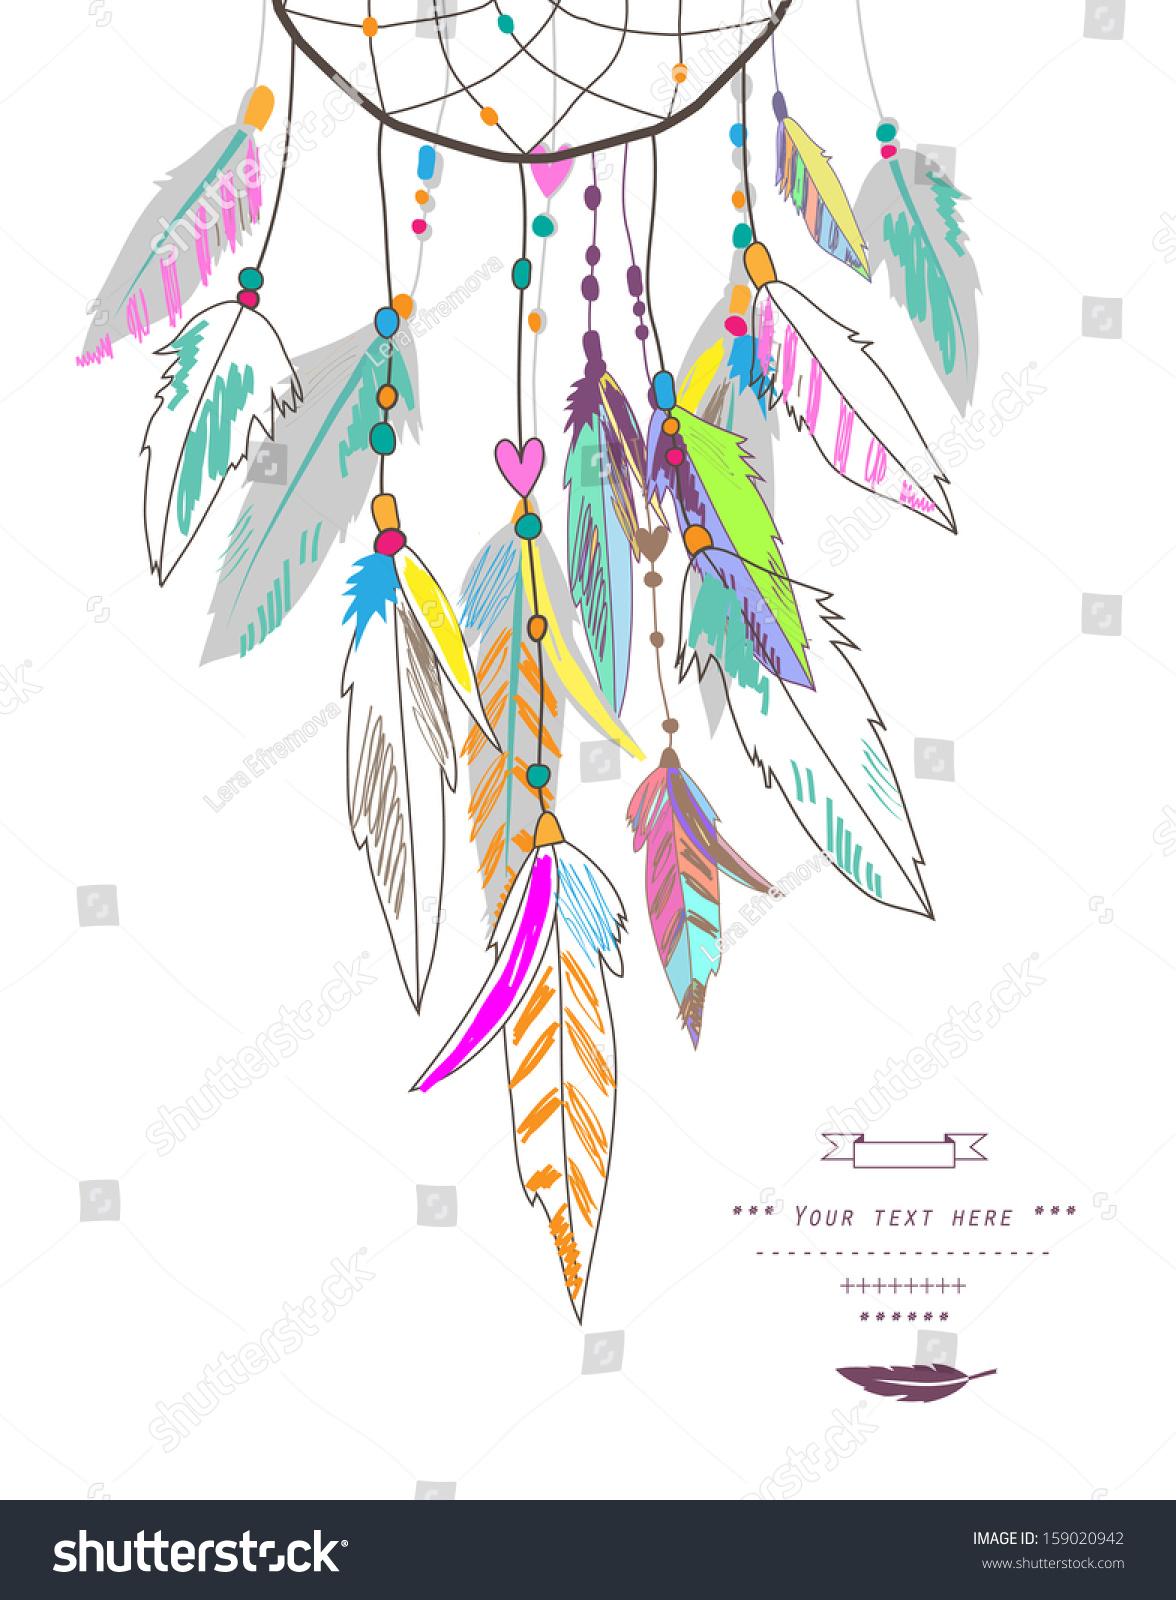 Dream Catcher Vector Illustration Stock Vector 159020942 ...